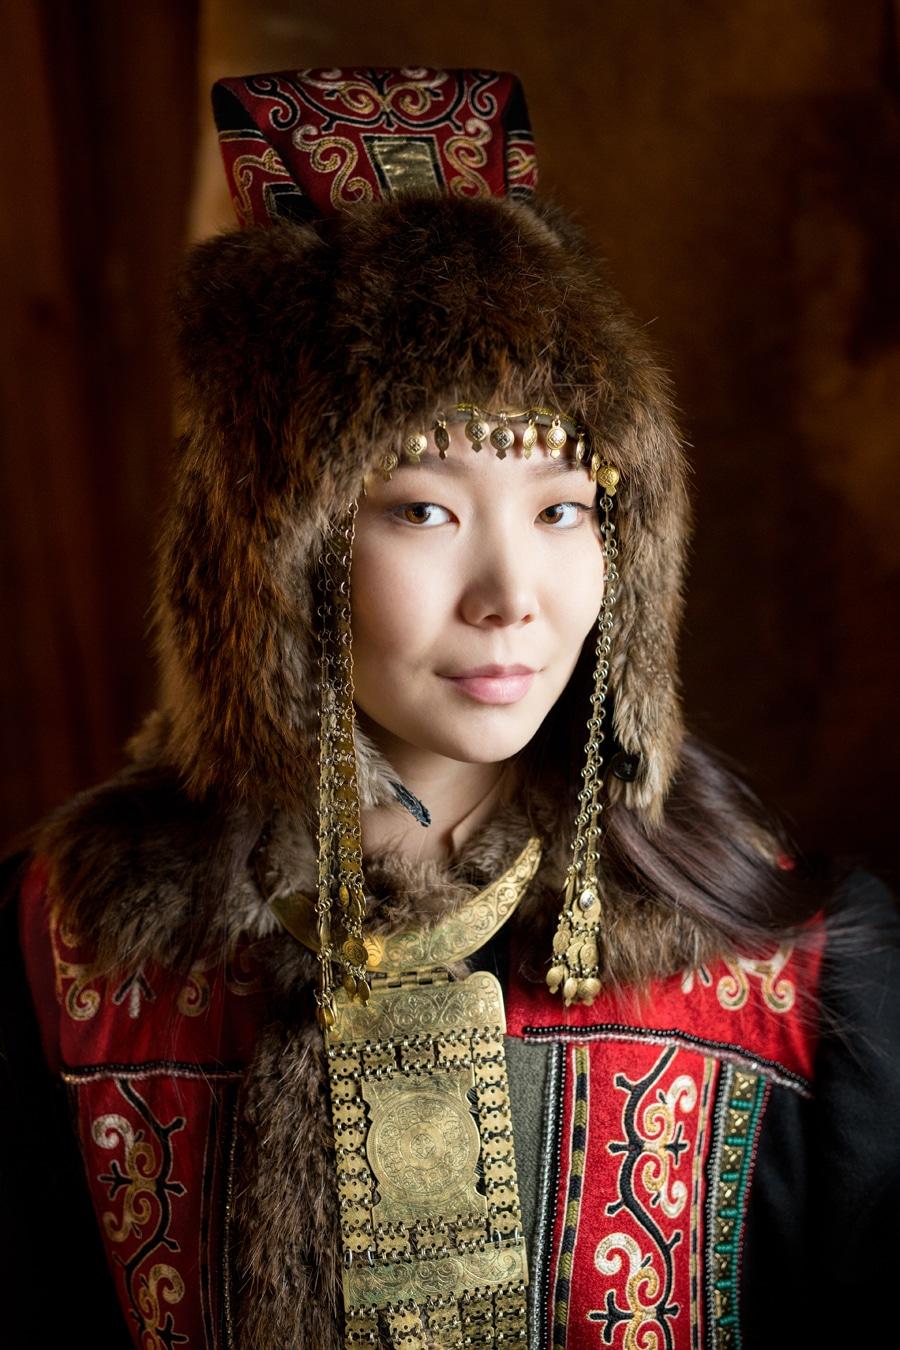 Alexander Khimushin indigenous people Siberia